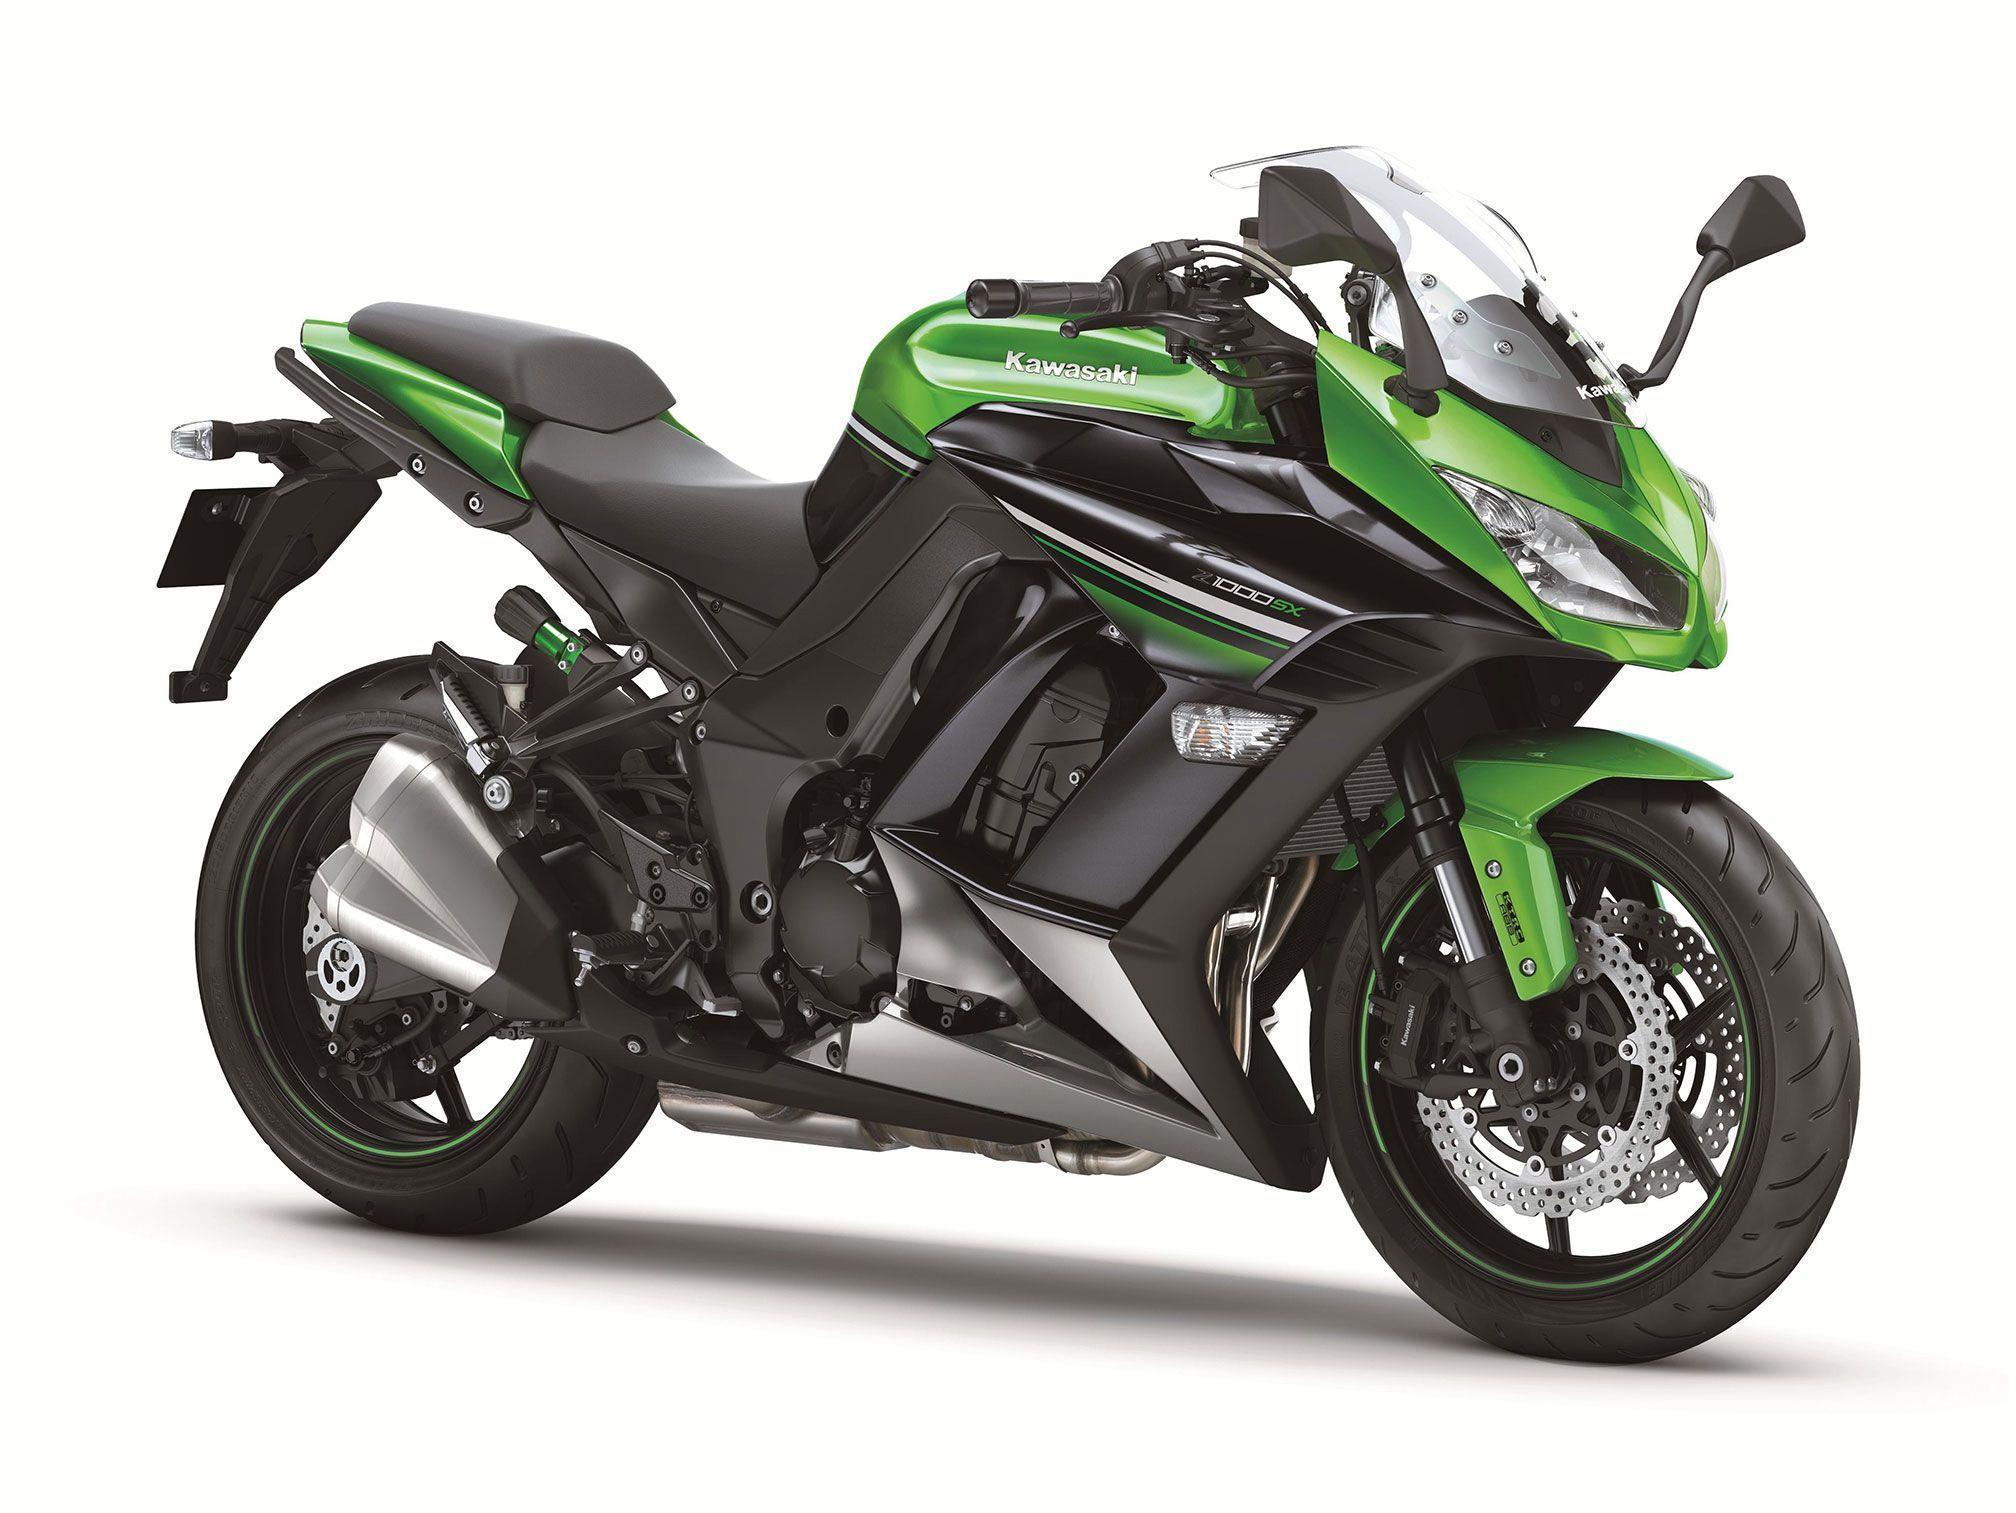 KAWASAKI Z1000SX 2017 黑色 - 「Webike摩托車市」